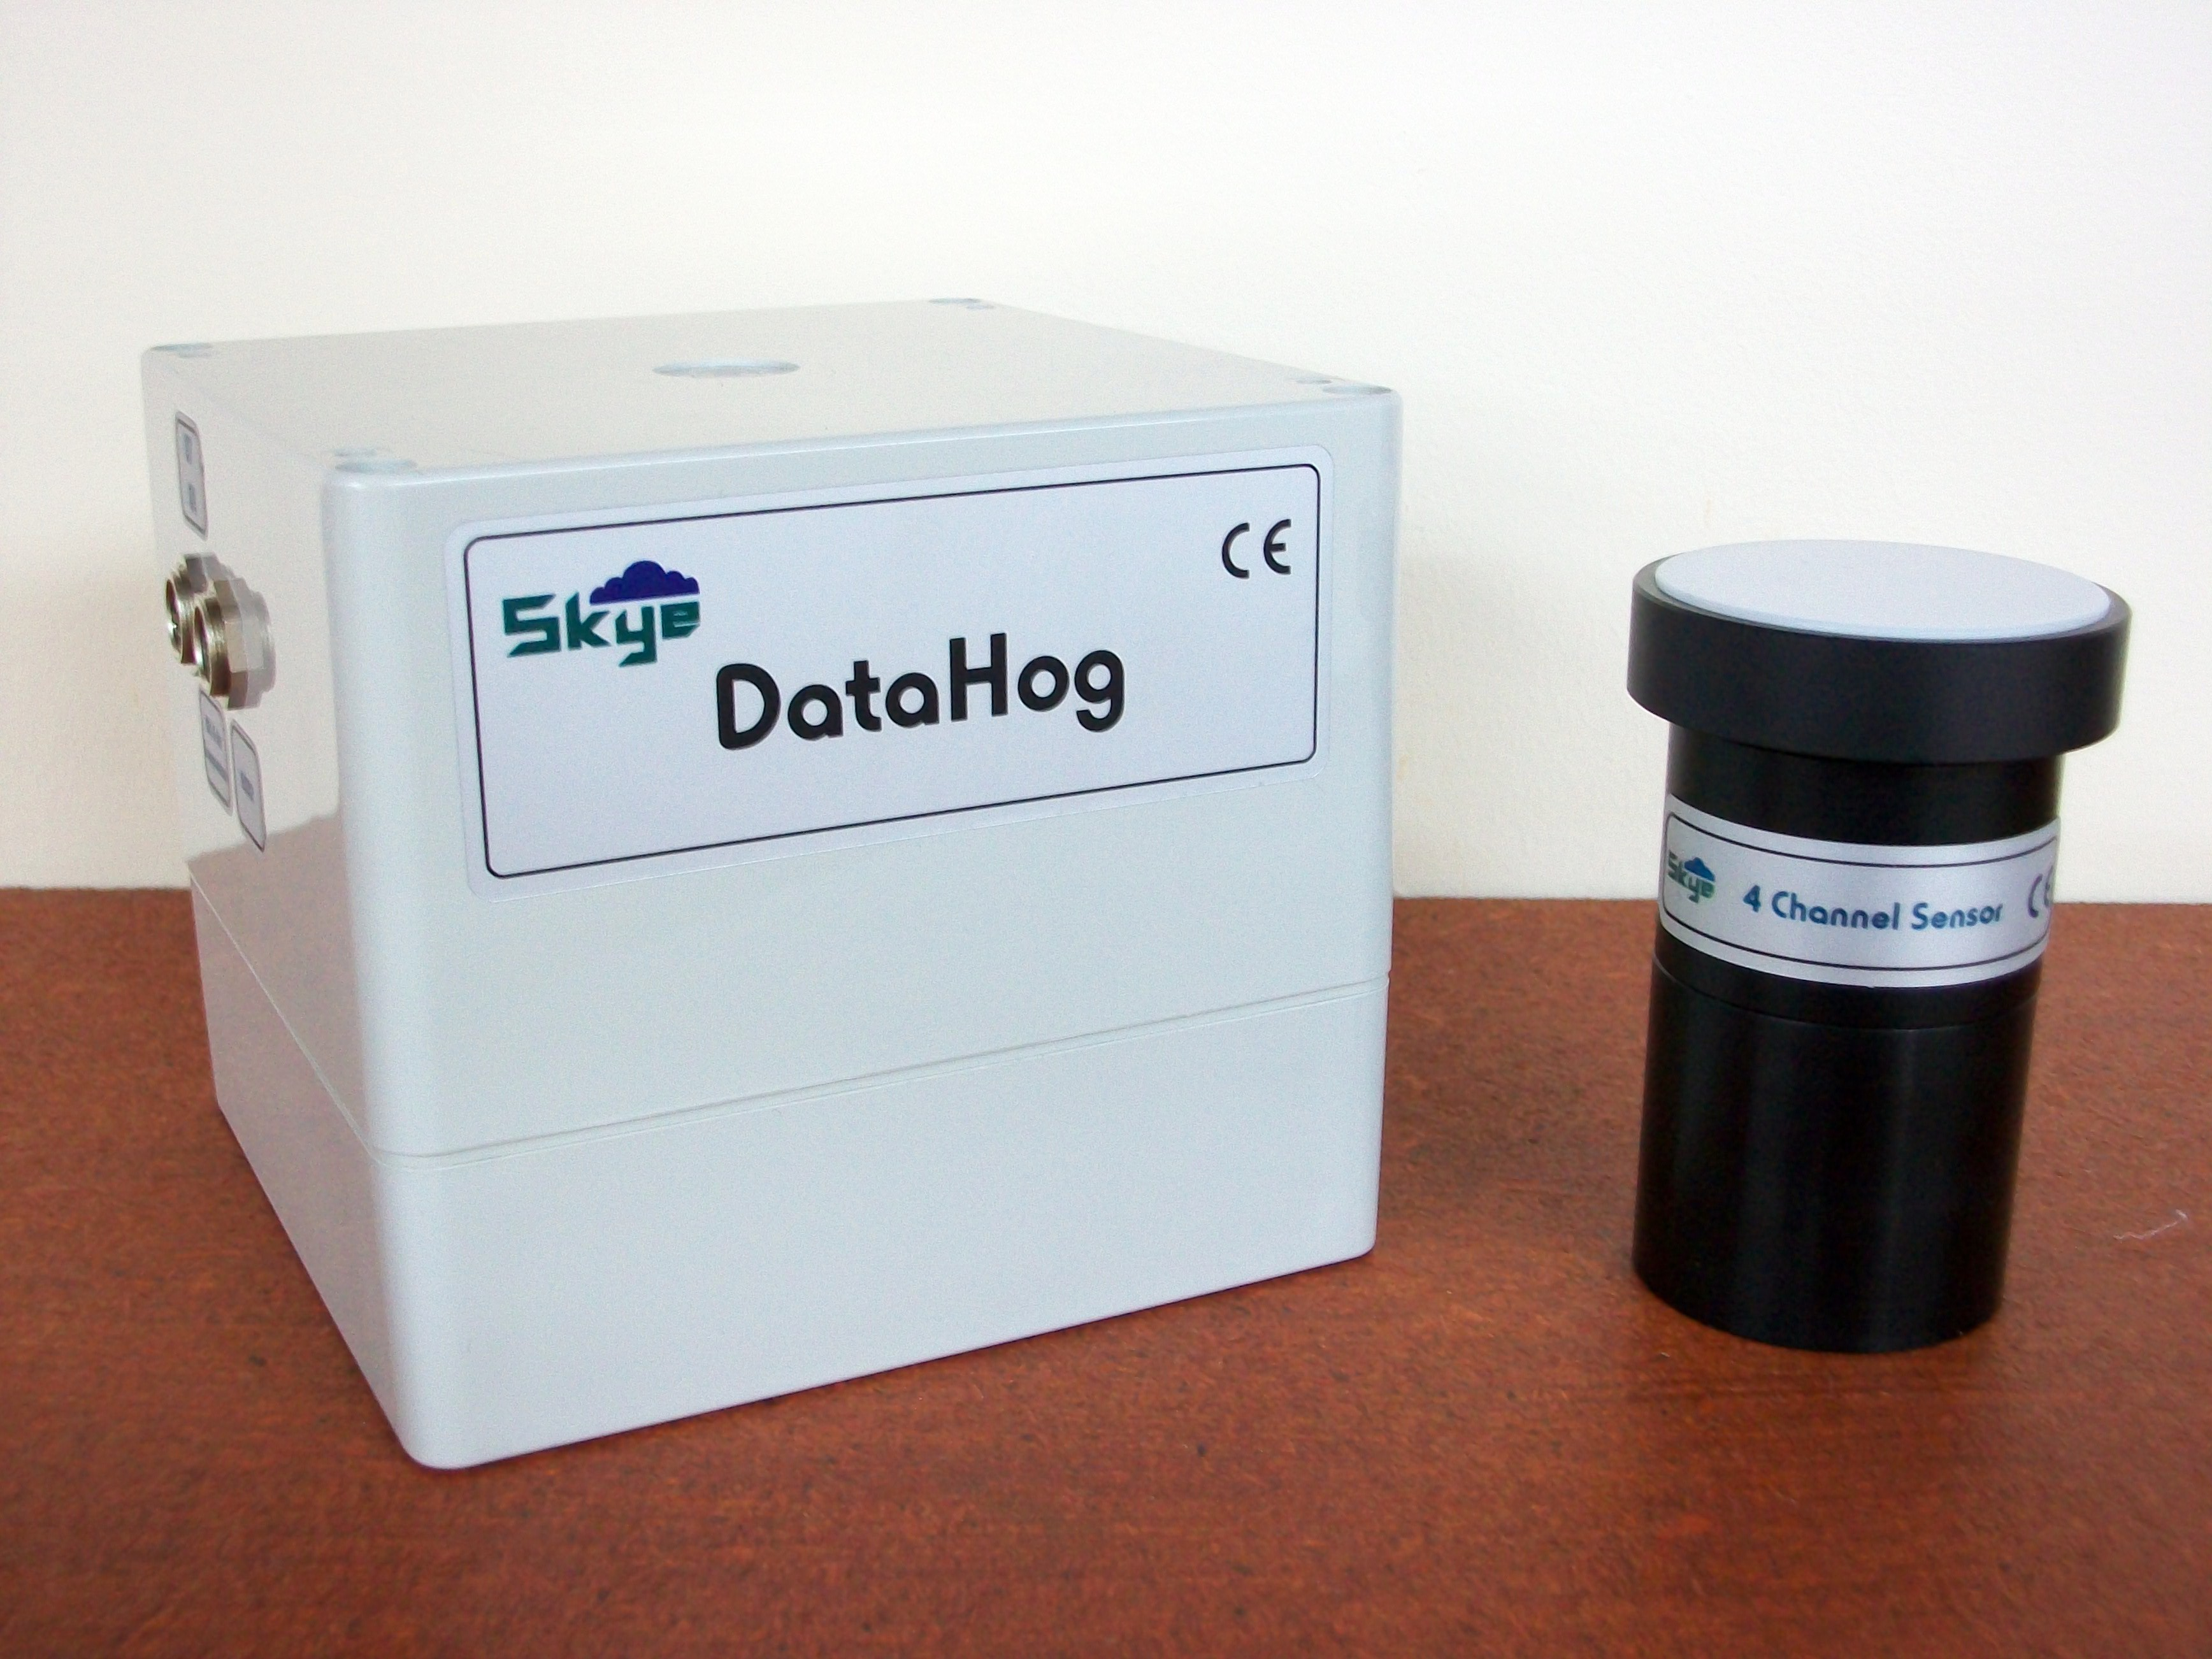 DataHog 2 Data Logger from Skye Instruments